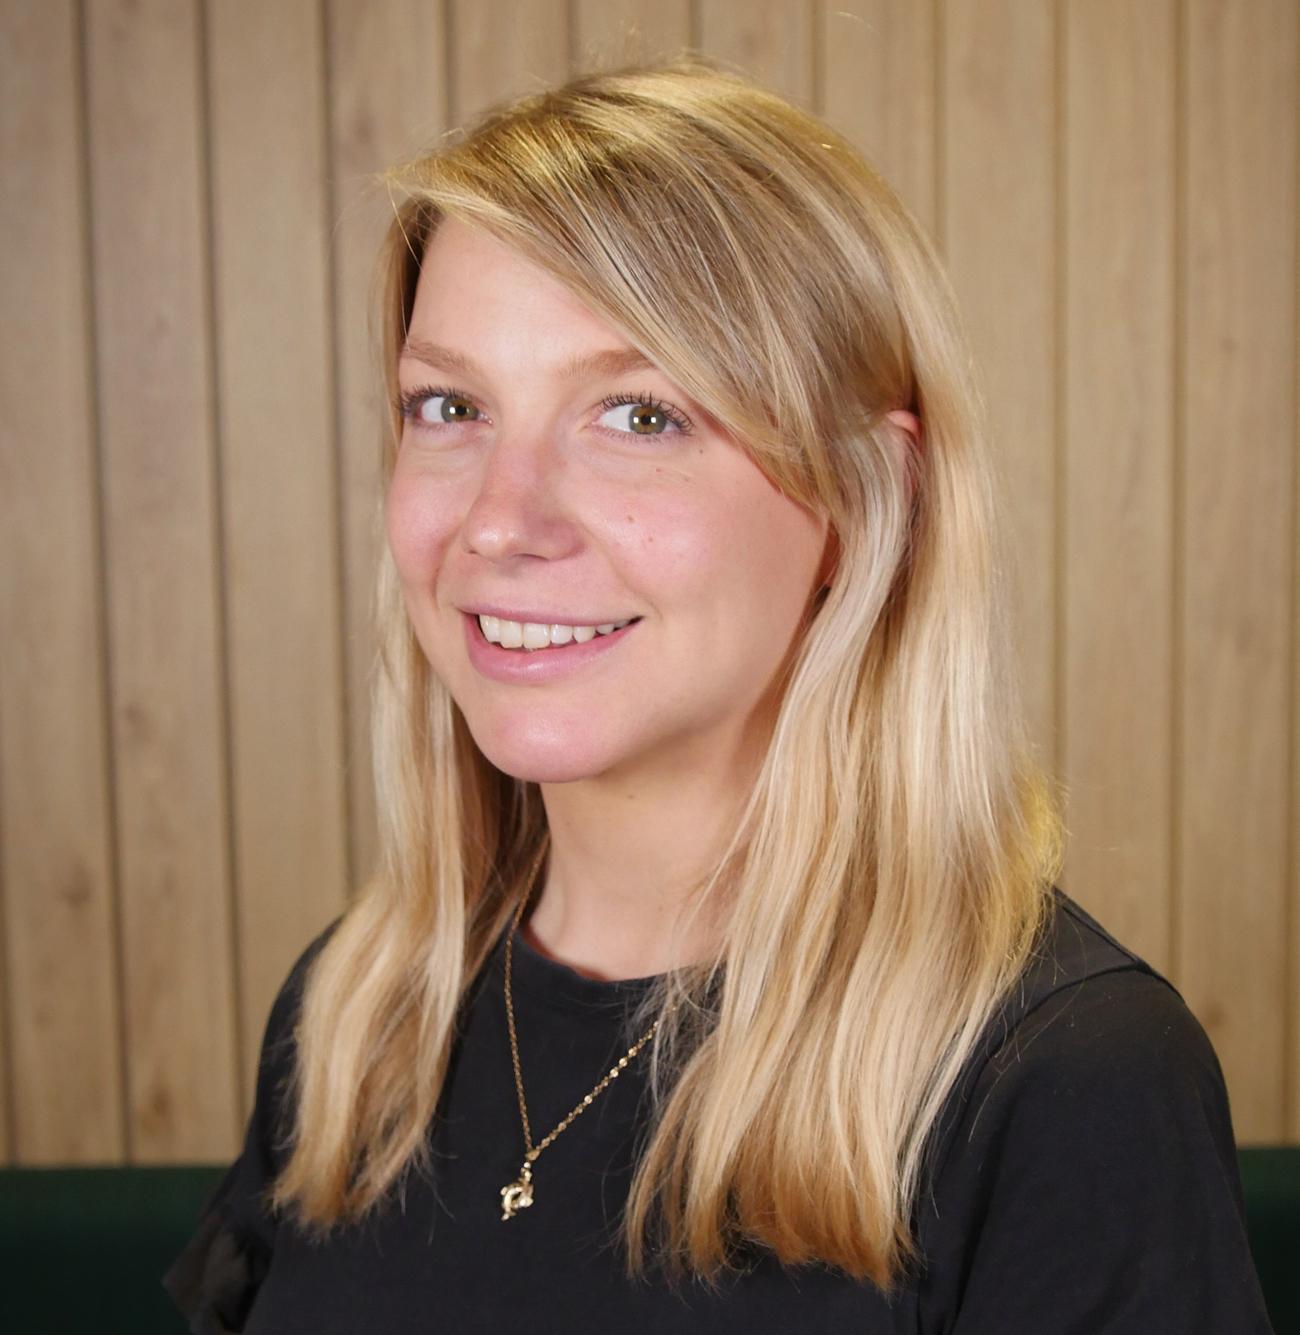 Emma Ashdown